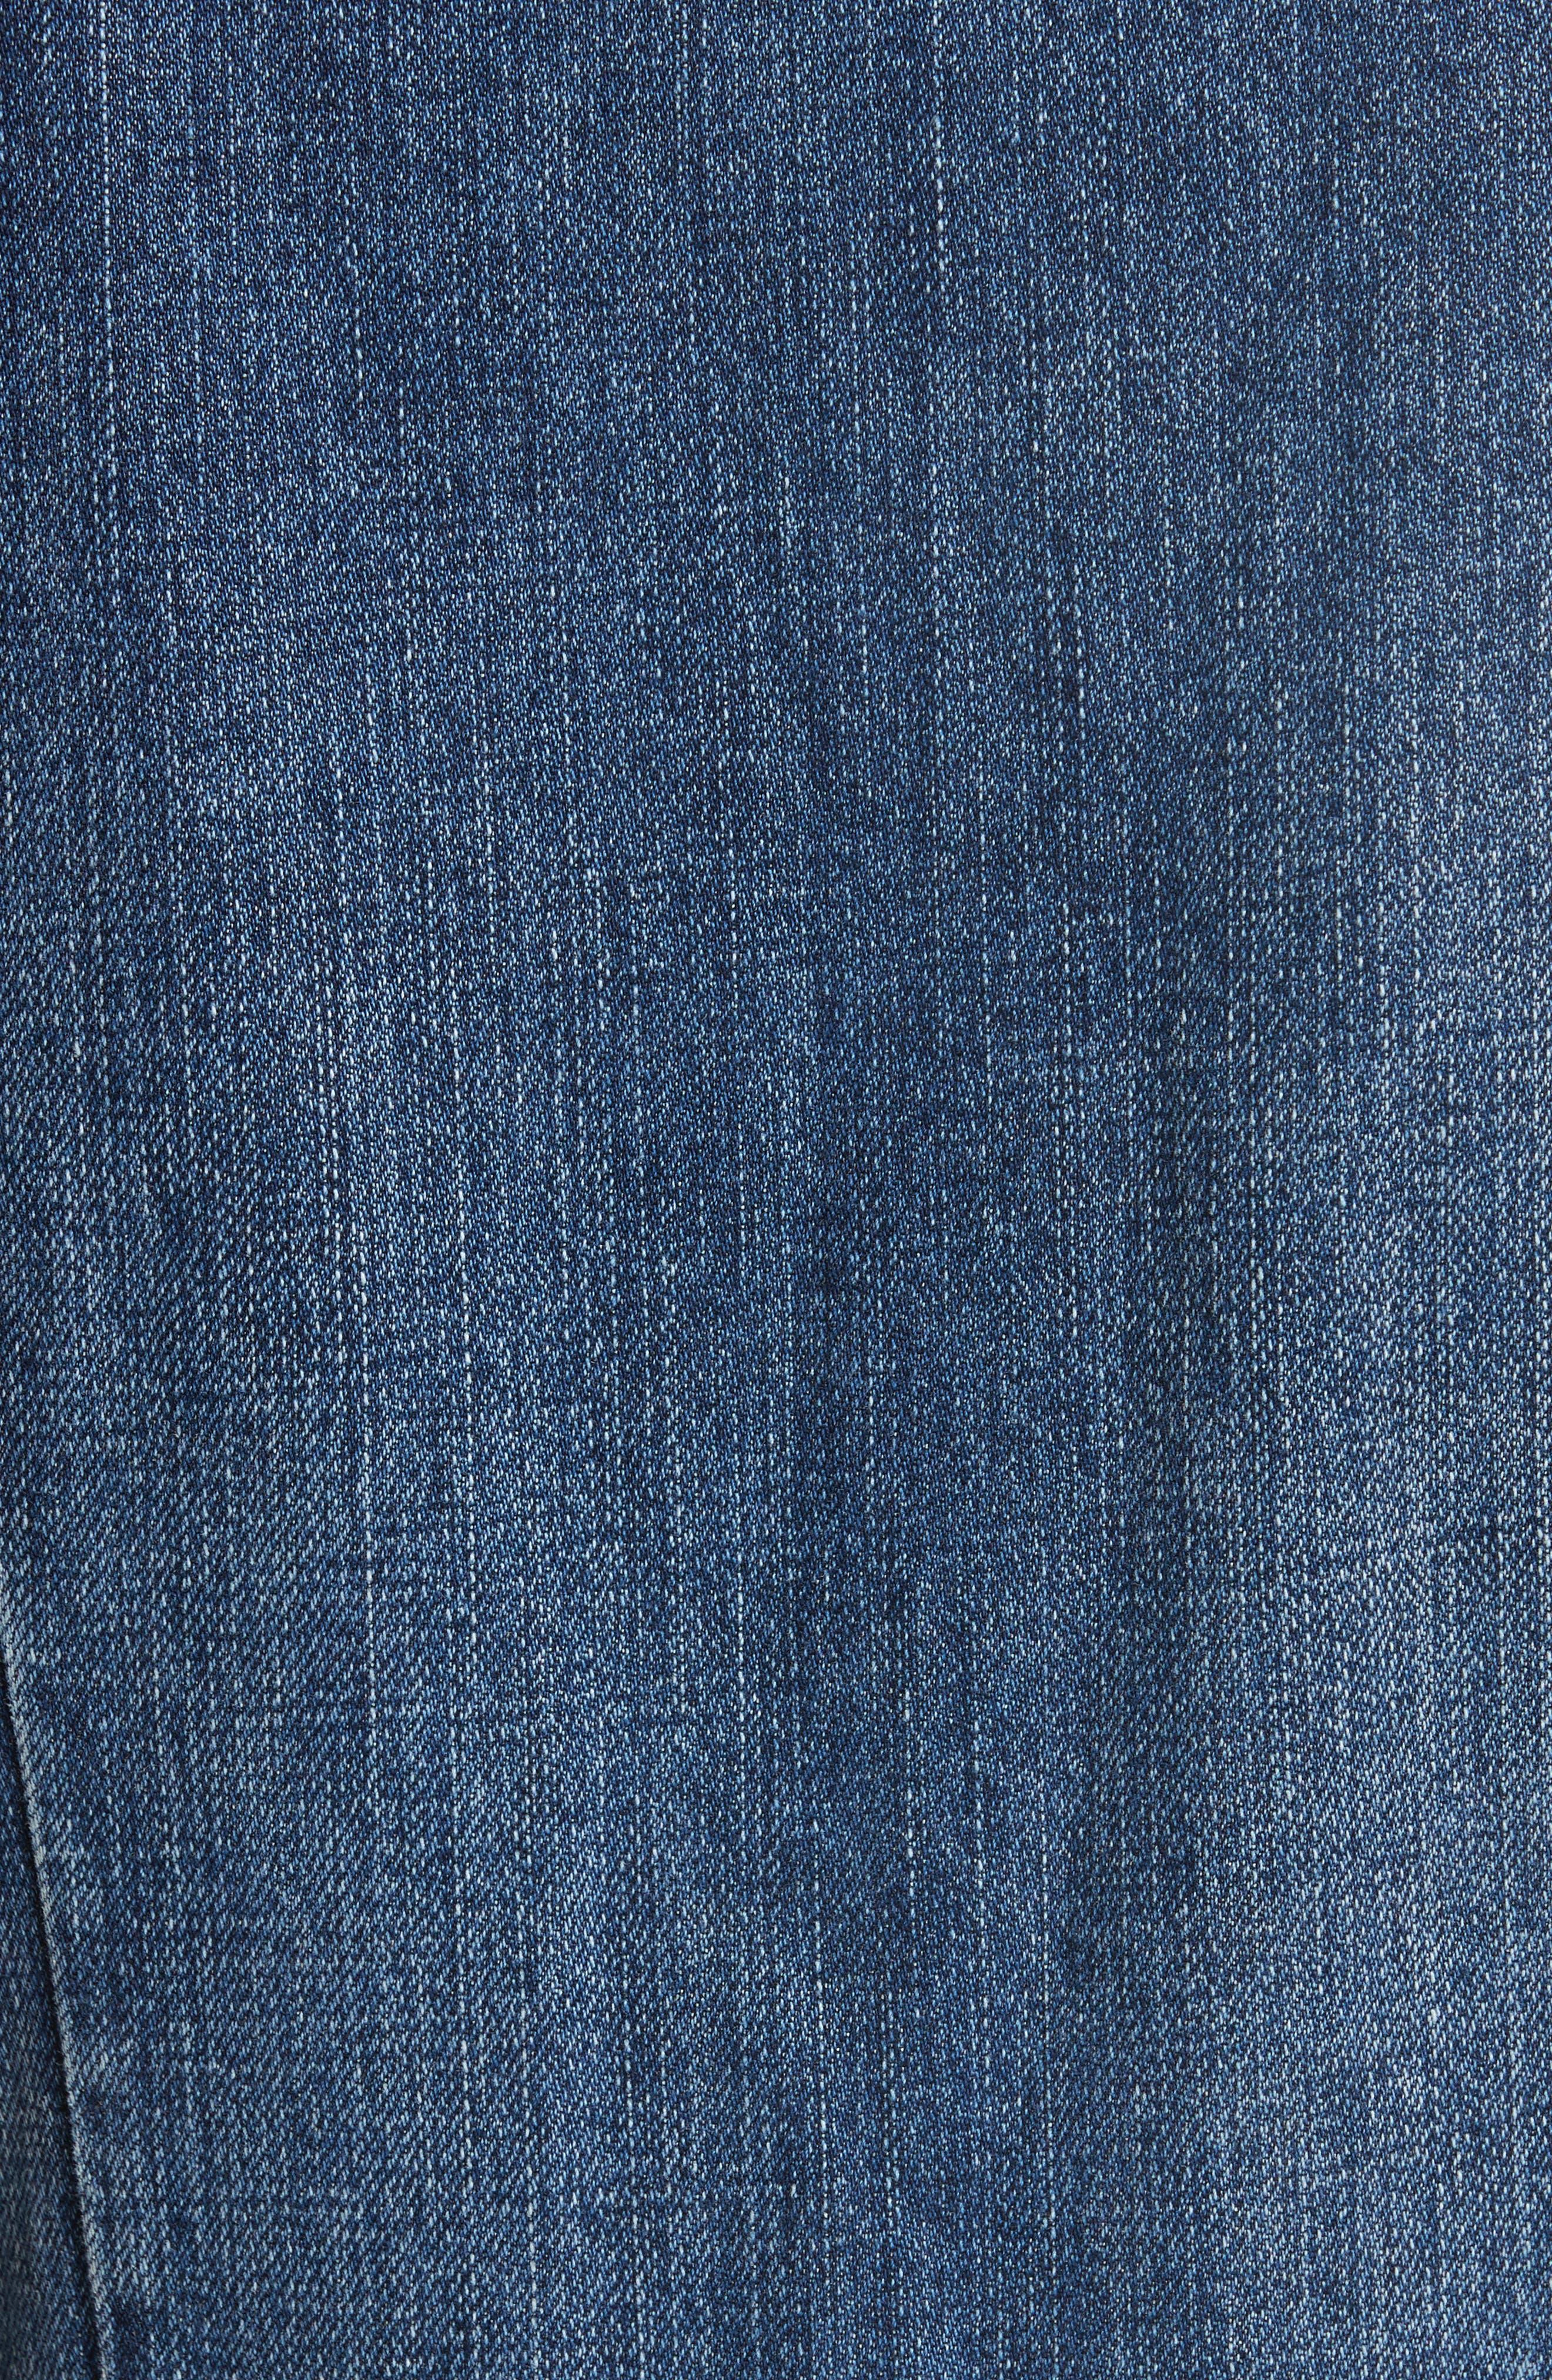 Denim Fit & Flare Midi Dress,                             Alternate thumbnail 6, color,                             INDIGO